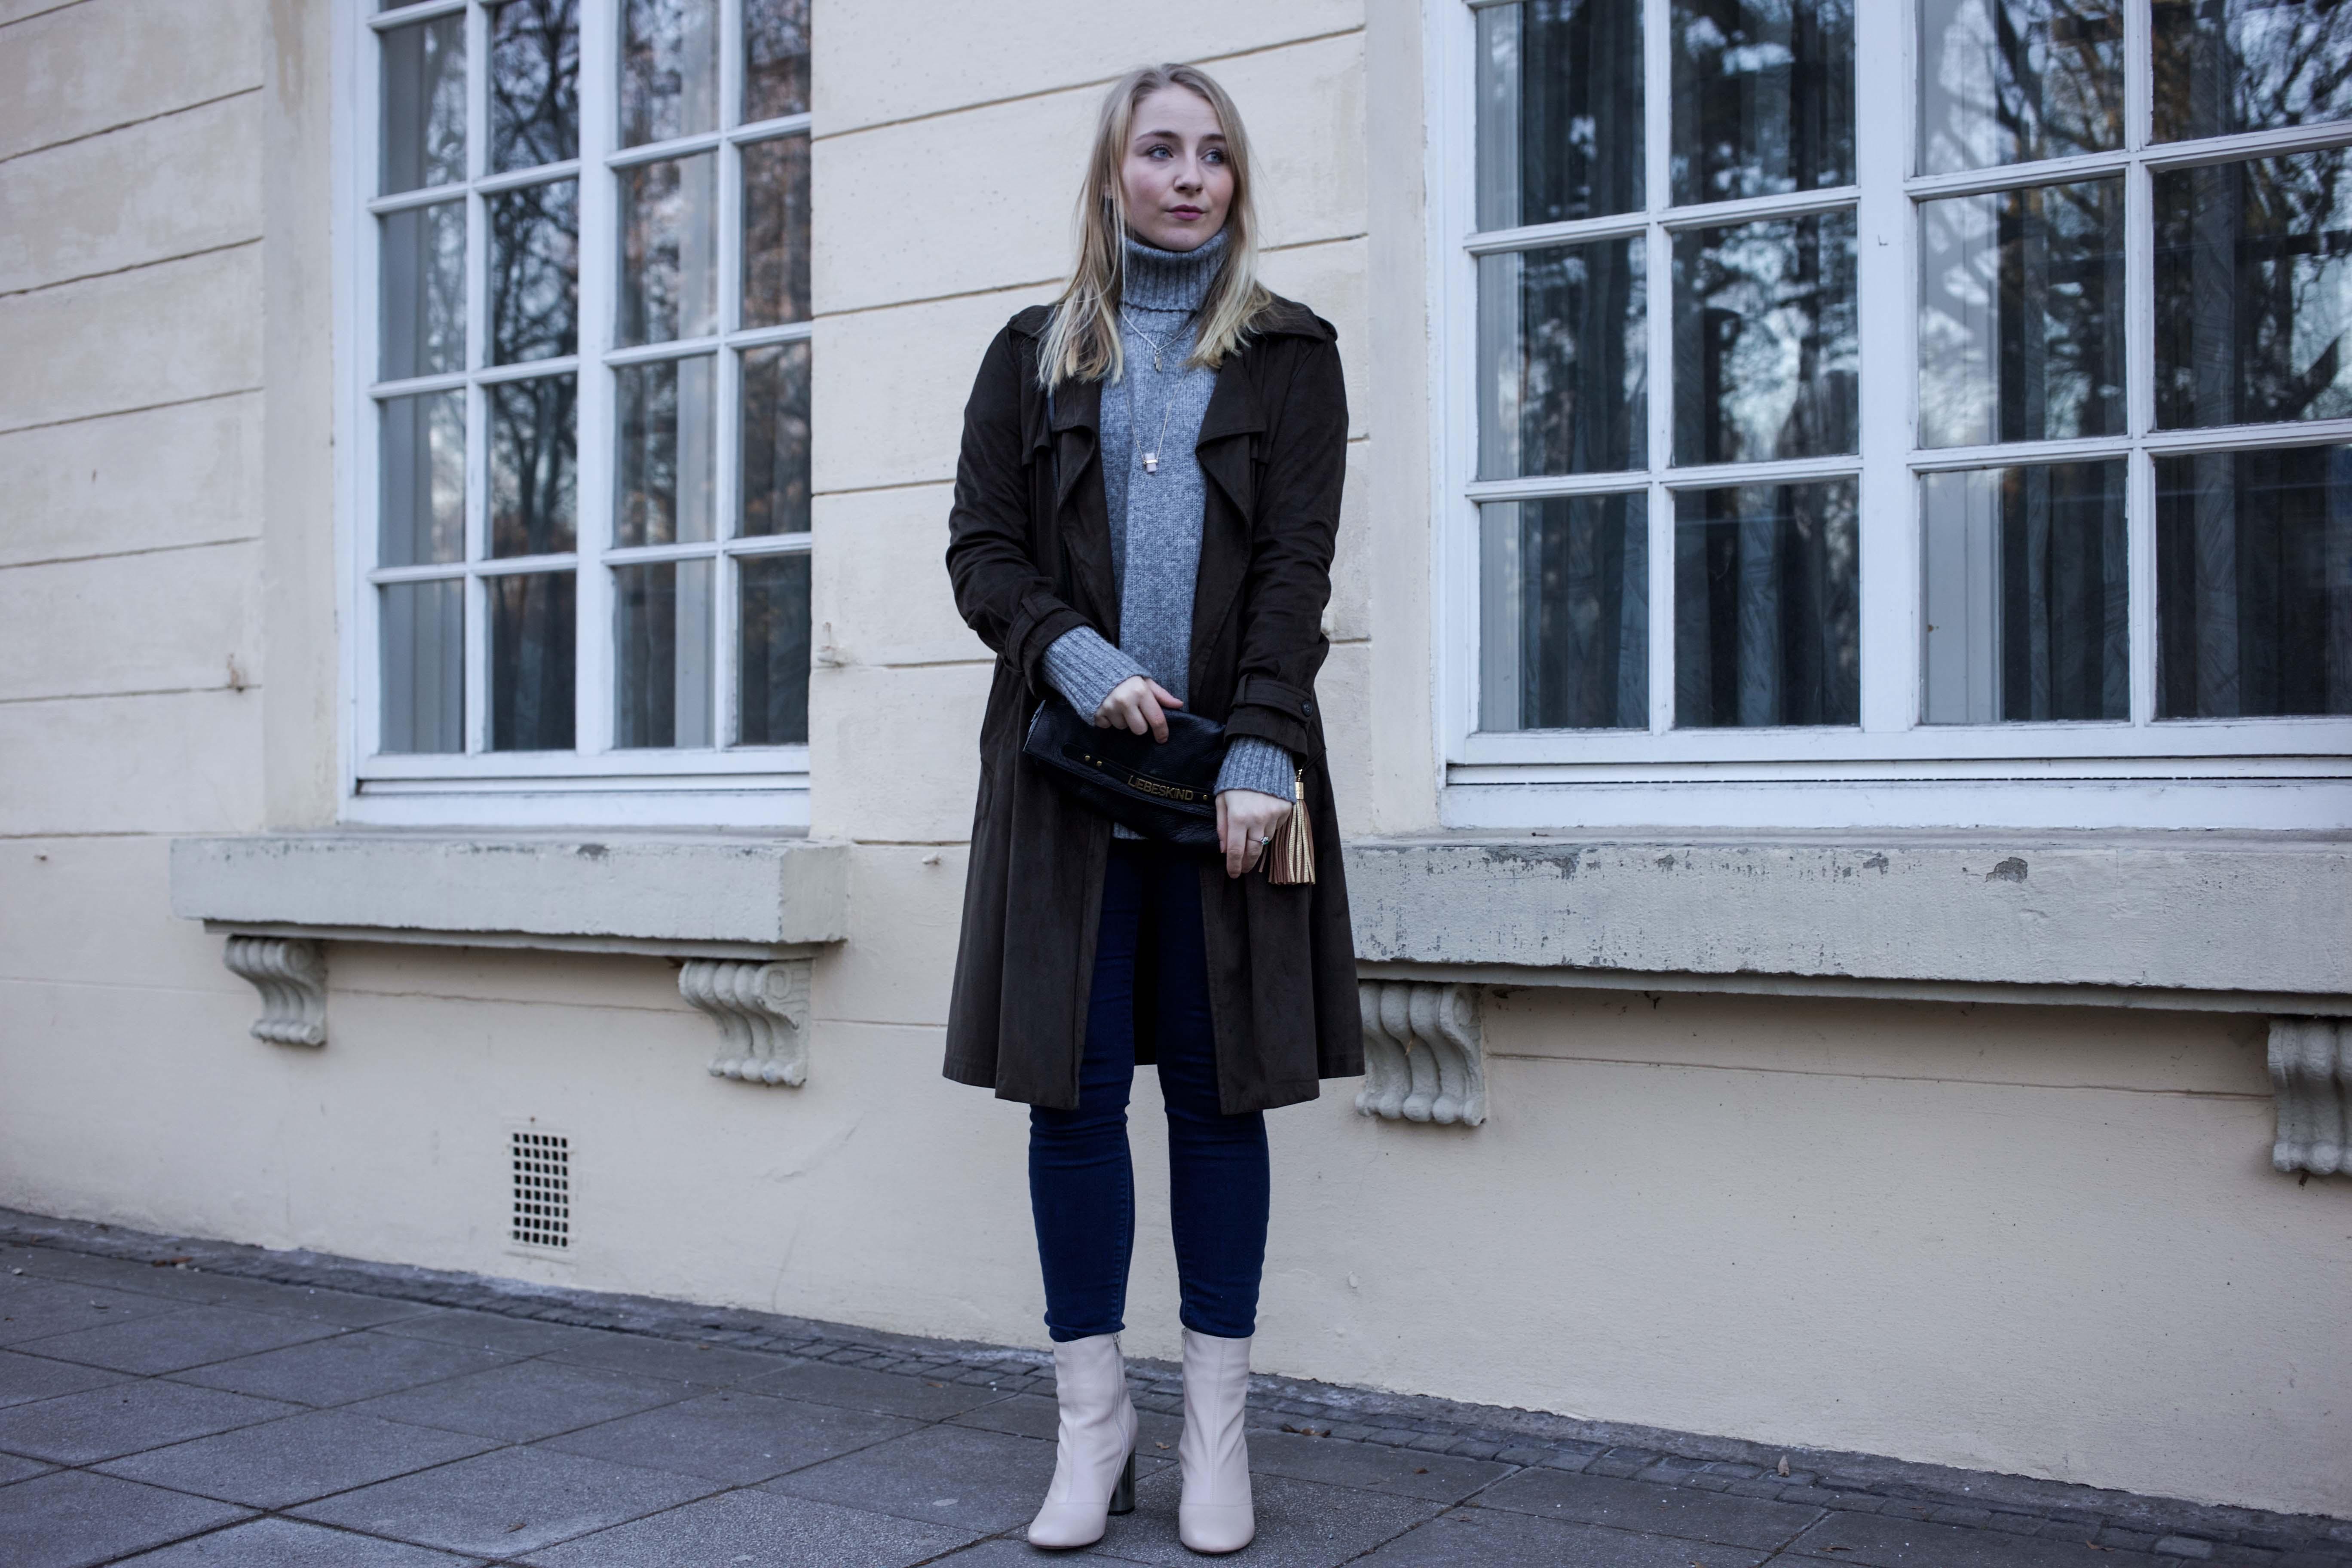 turtleneck-trench-coat-streetstyle-modeblog-fashionblog-bonn-berlin-köln-lederstiefel-silberabsatz-outfi_9206